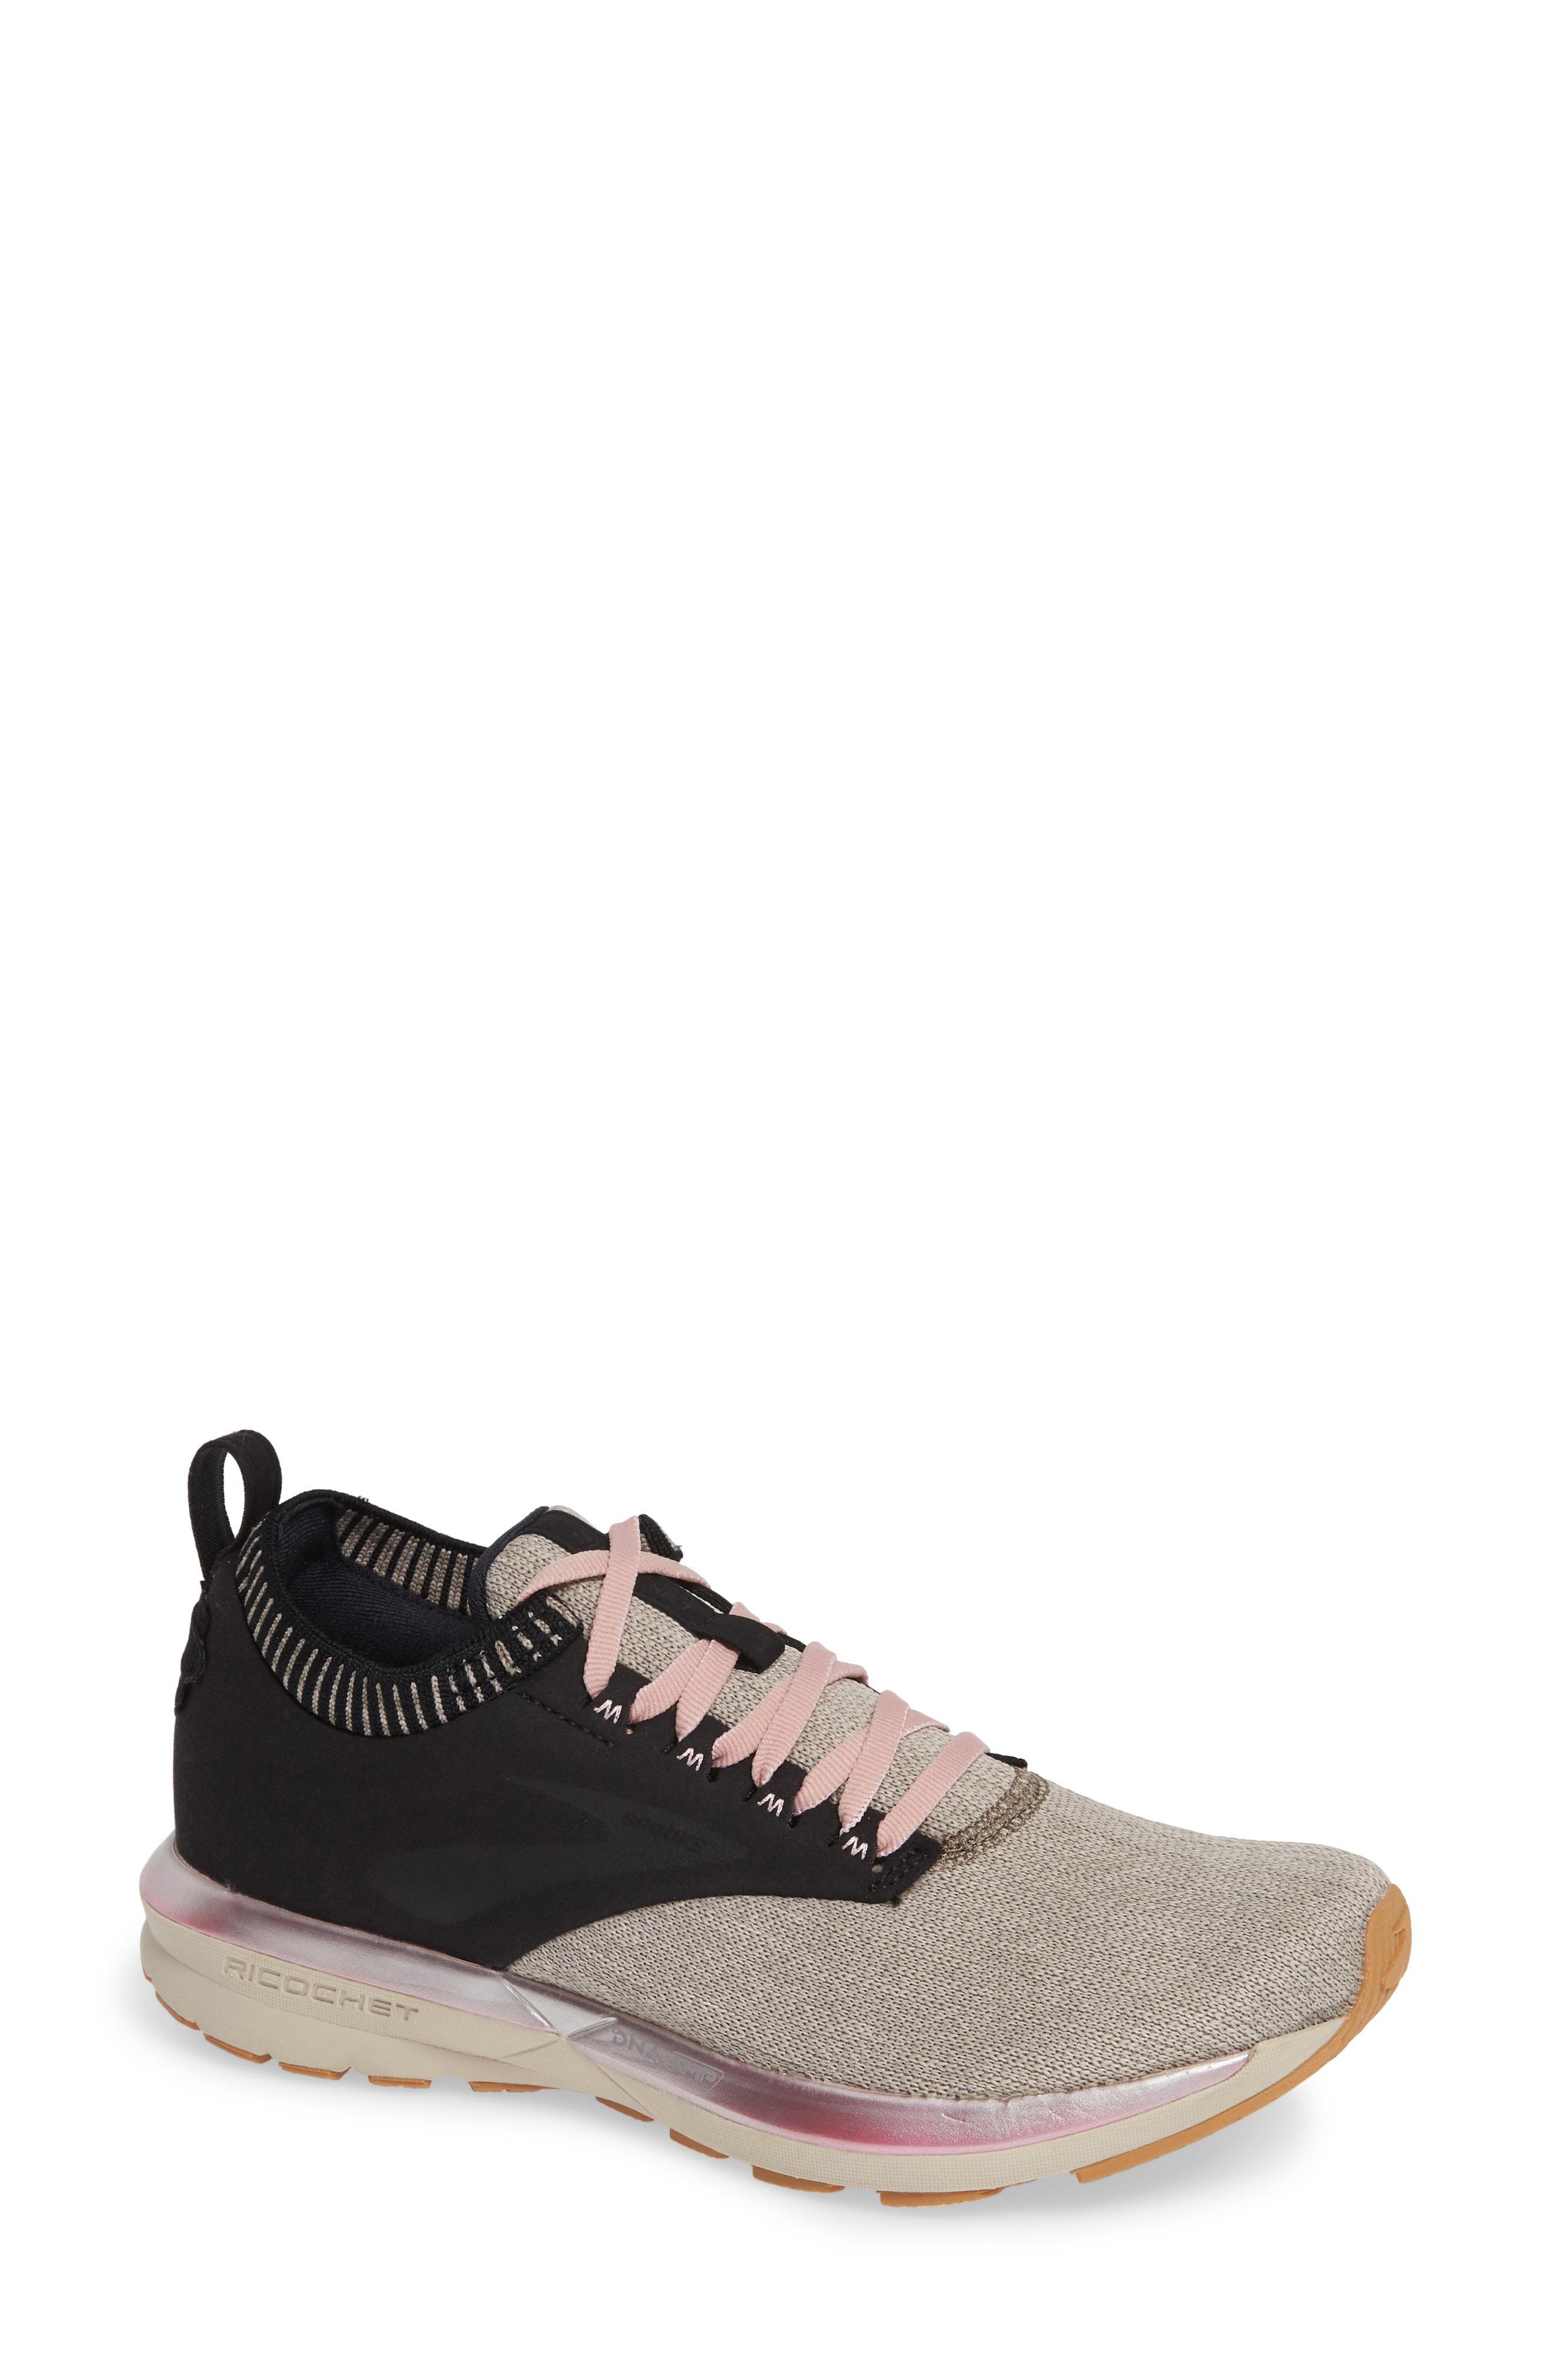 Brooks Women's Ricochet Le Running Shoes, Black